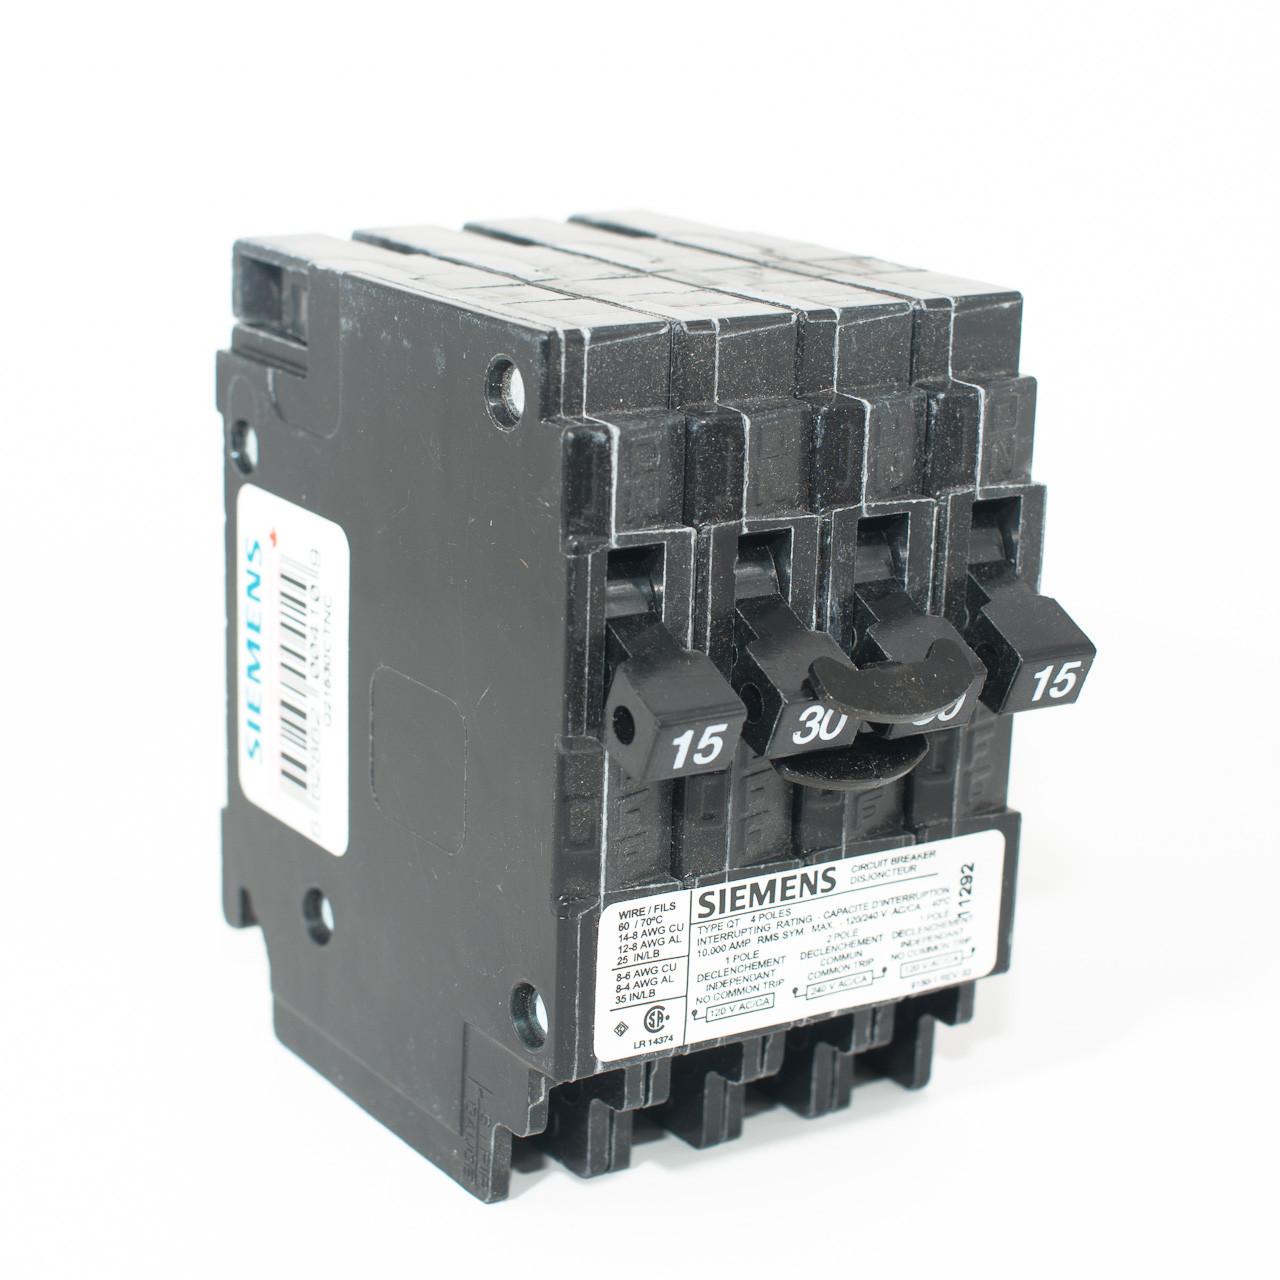 small resolution of siemens q21530ctnc 15 2p30 15 quad push on breaker tremtech electrical systems inc